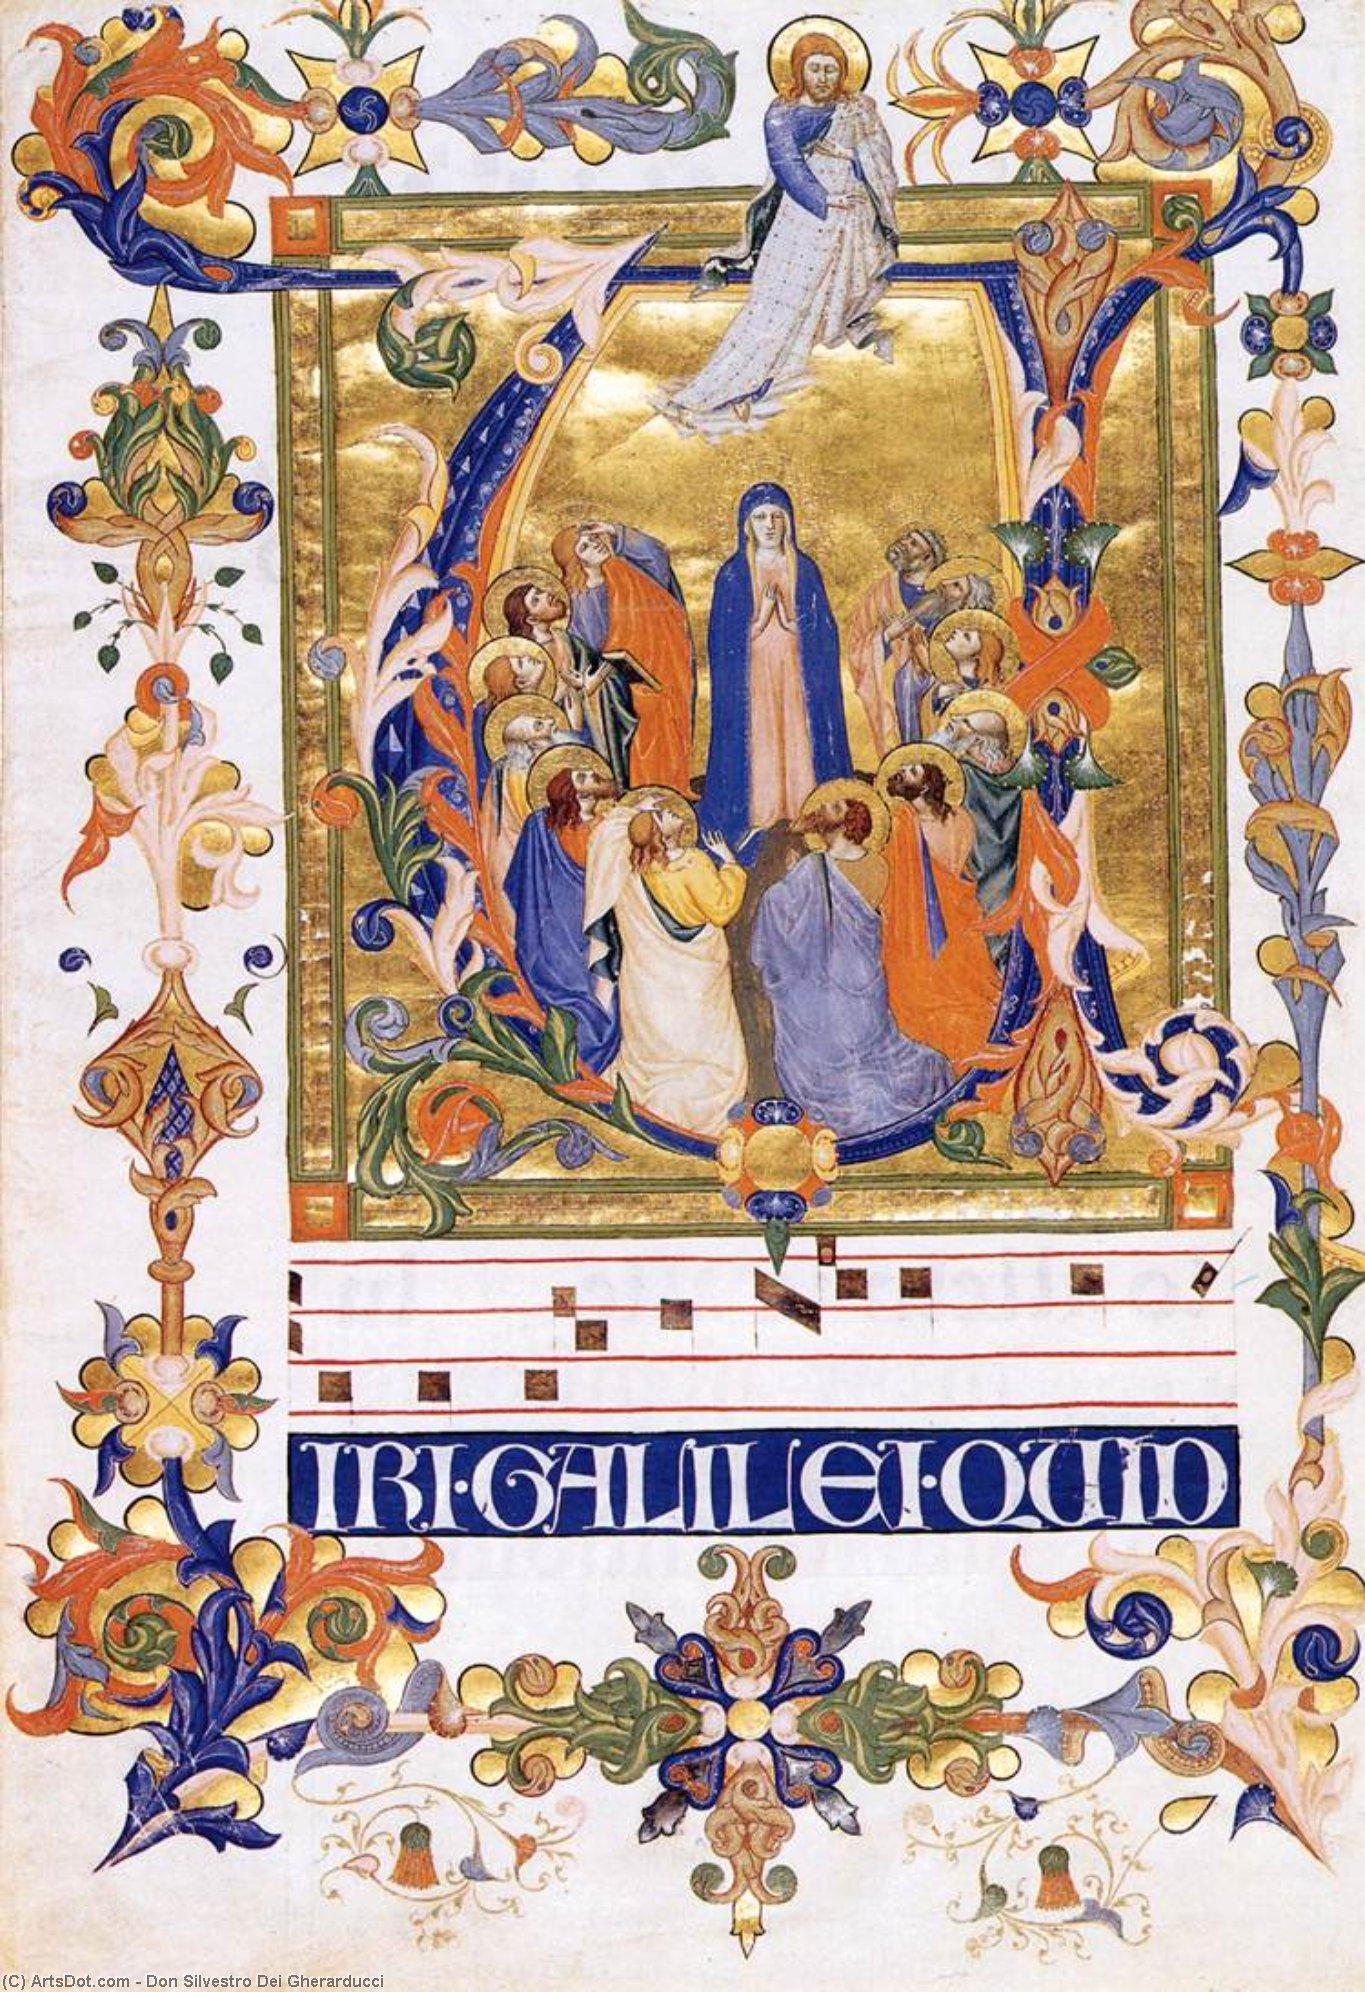 WikiOO.org - Enciklopedija dailės - Tapyba, meno kuriniai Don Silvestro Dei Gherarducci - Gradual 2 for San Michele a Murano (Folio 44)